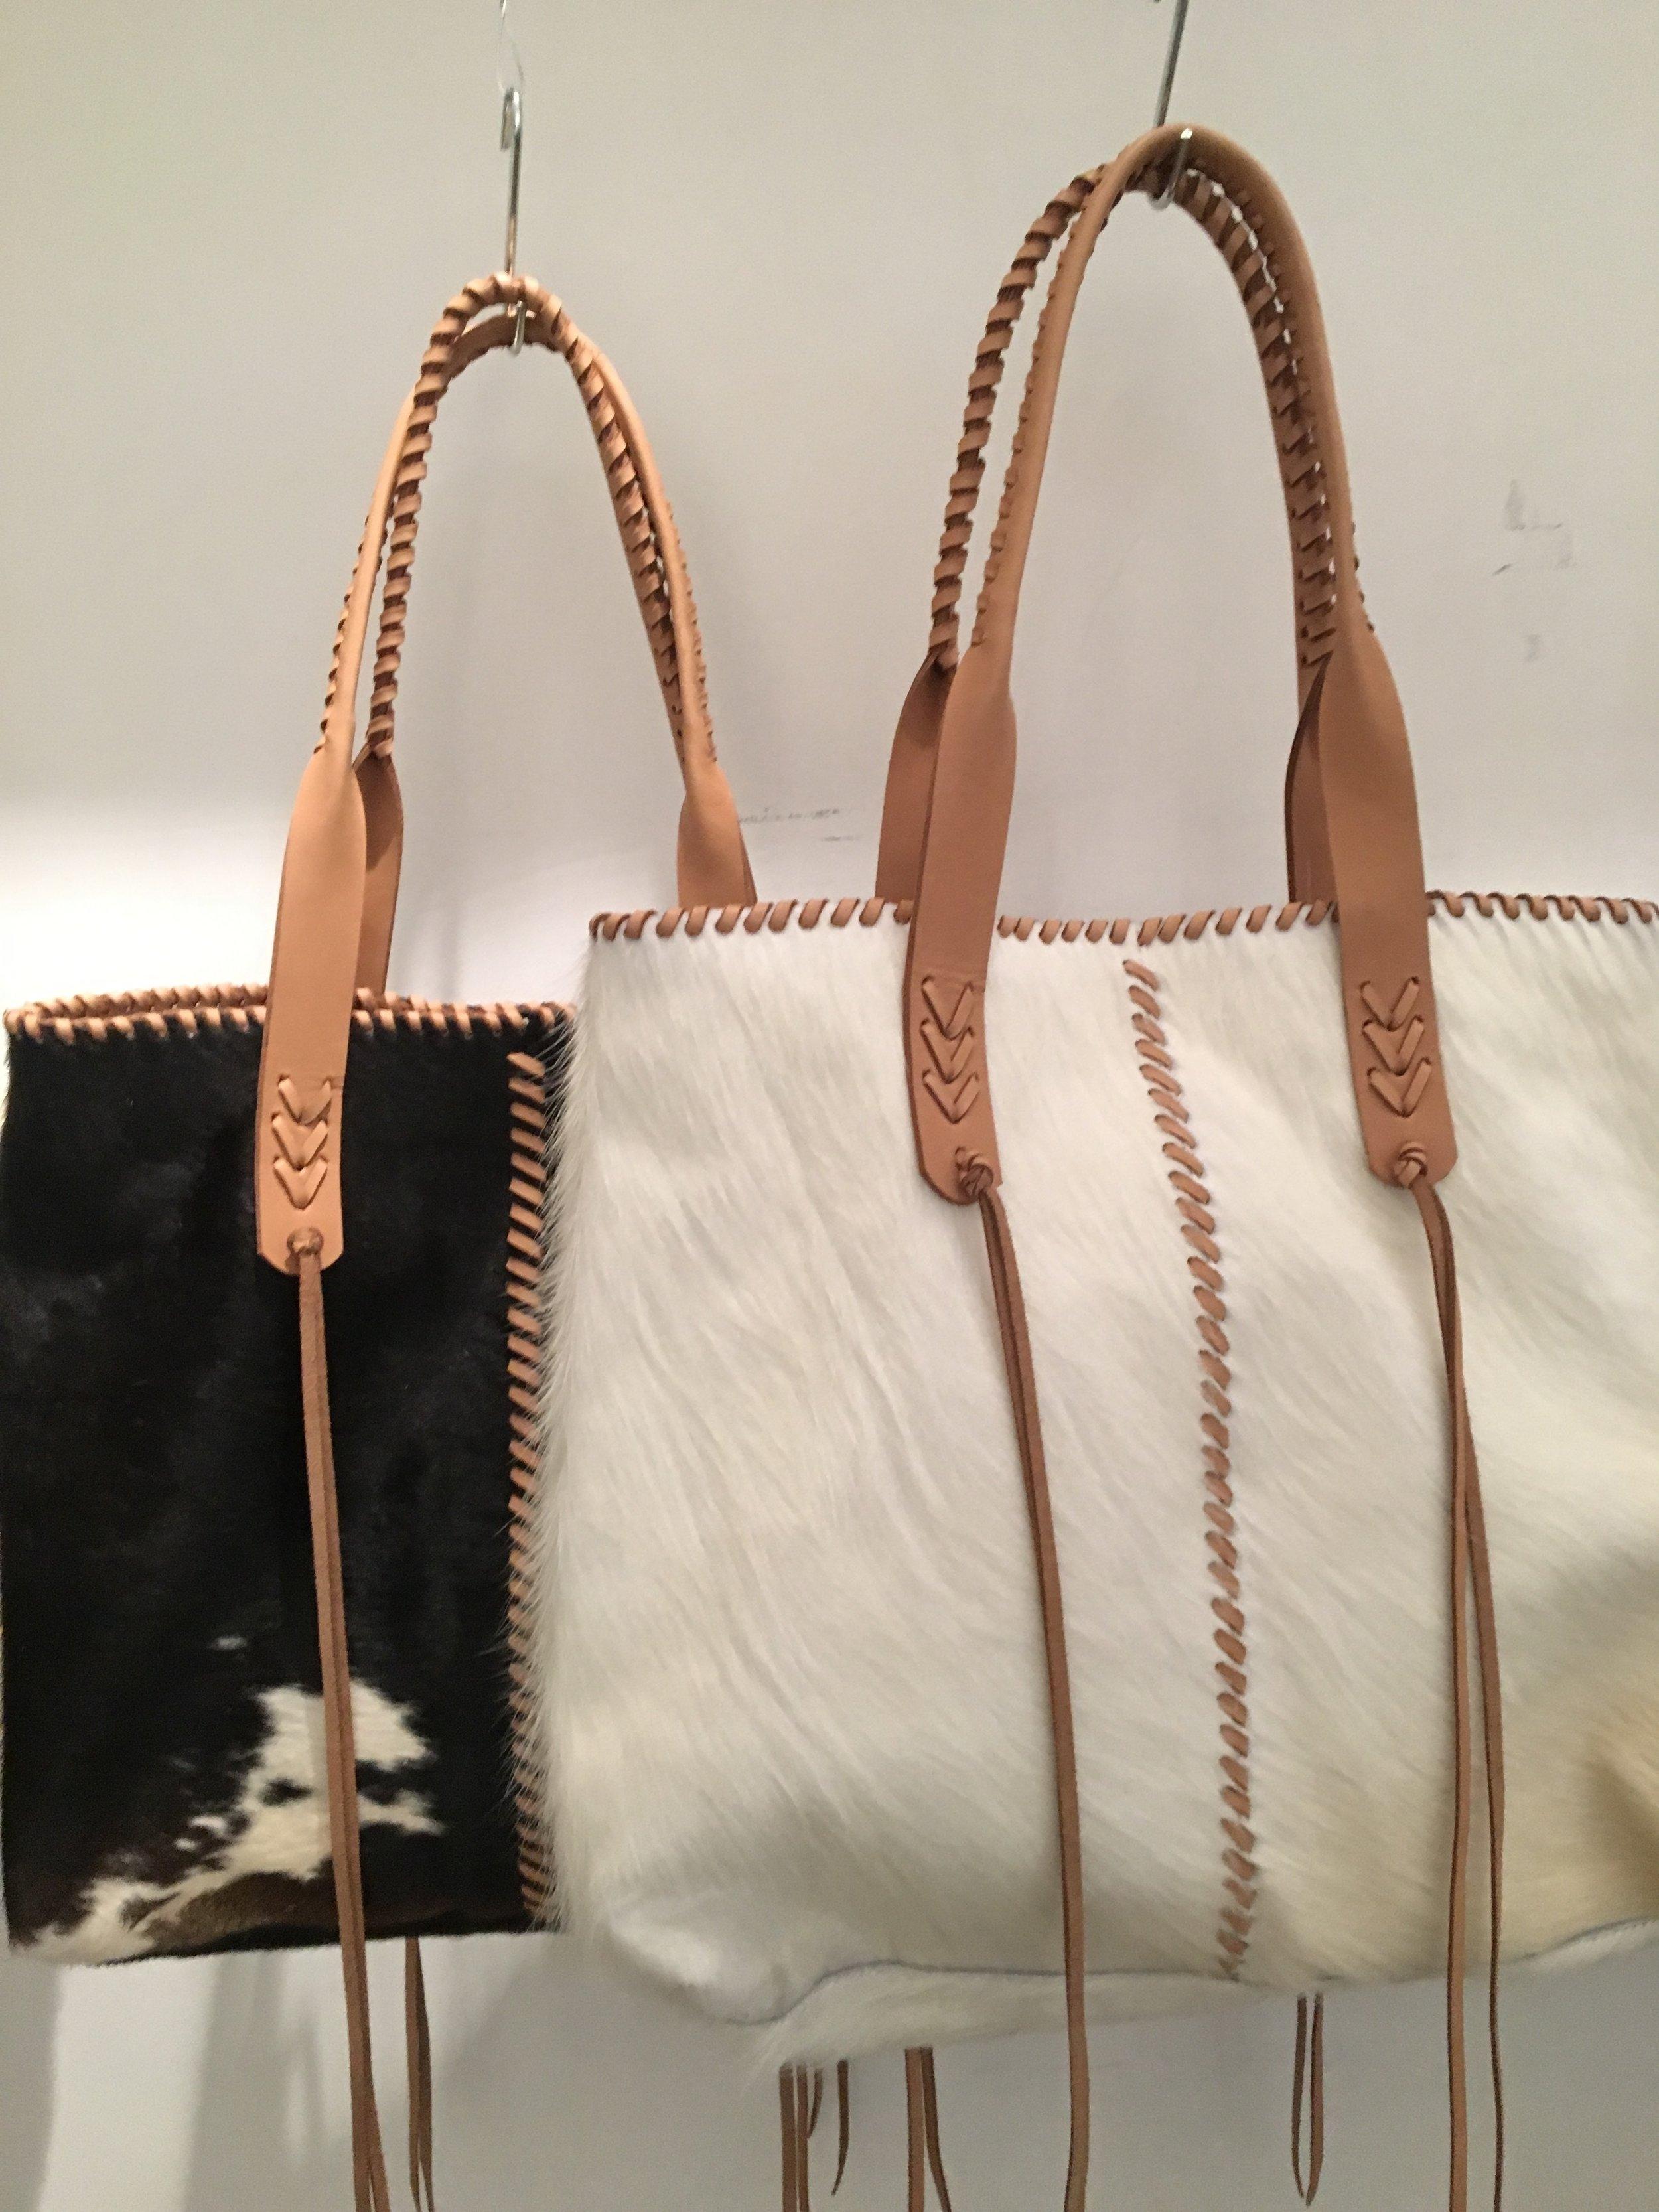 Handmade leather bags Buenos Aires argentina las cabrera.JPG